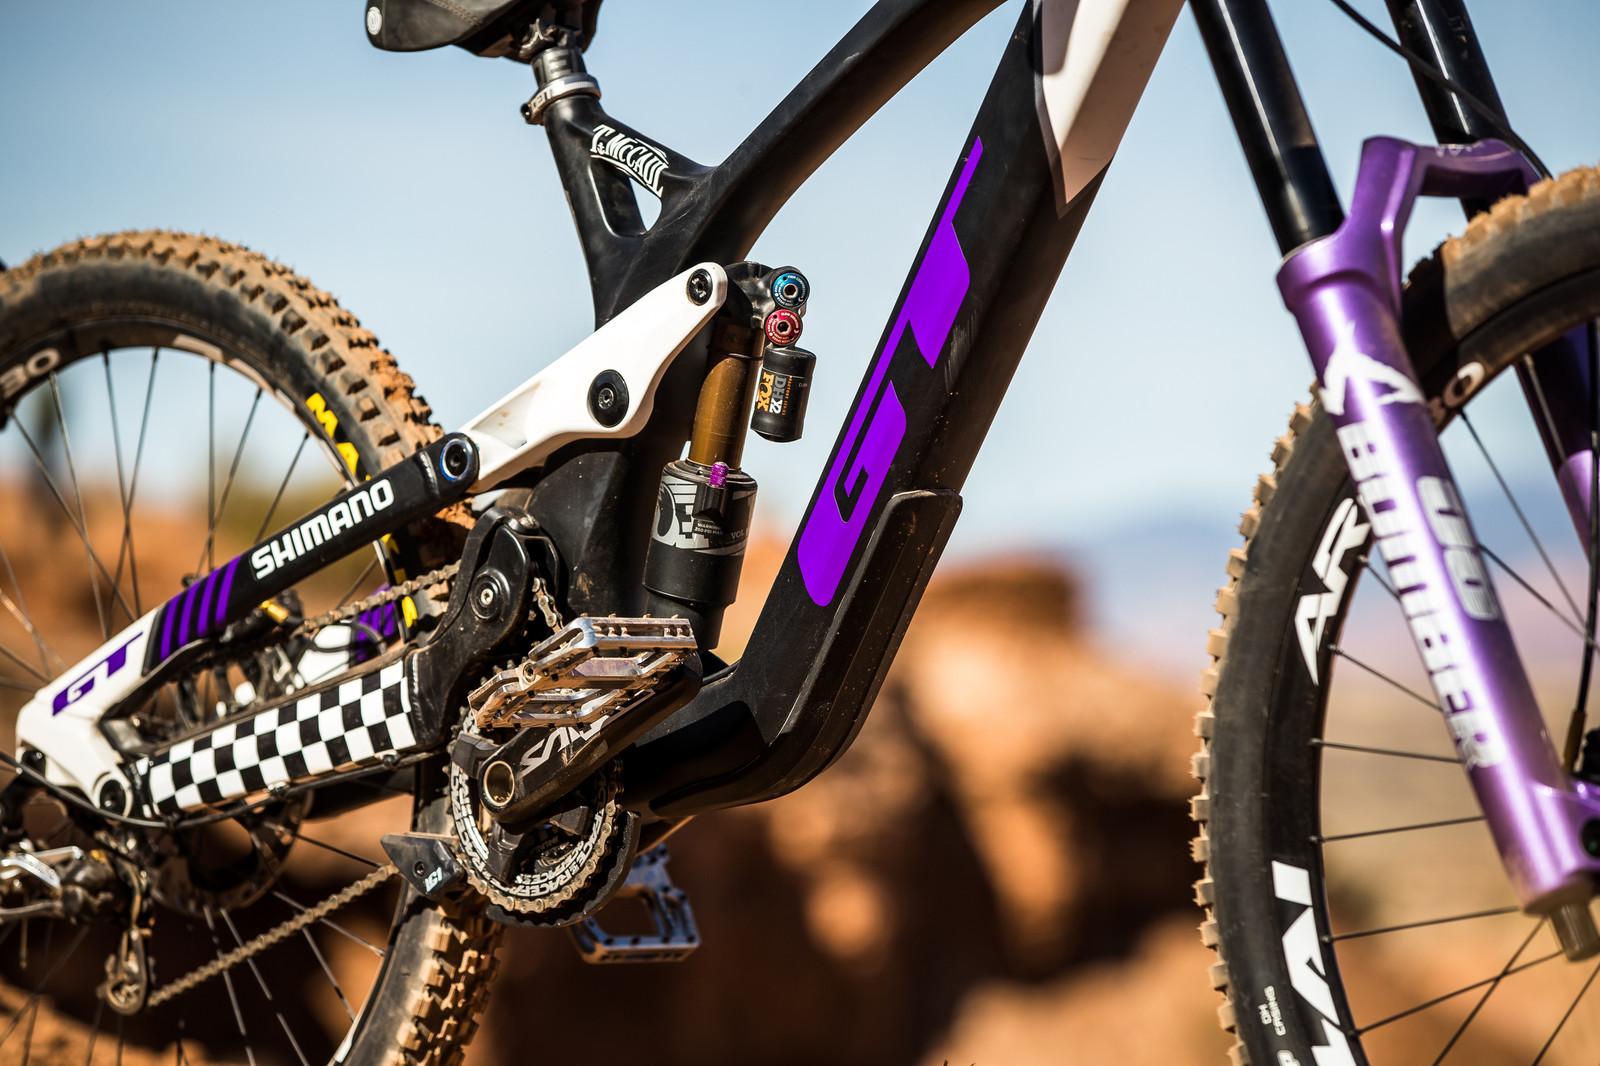 Purple Pop - Tyler McCaul's GT Fury for Rampage 2019 - RAMPAGE BIKE - Tyler McCaul's GT Fury - Mountain Biking Pictures - Vital MTB